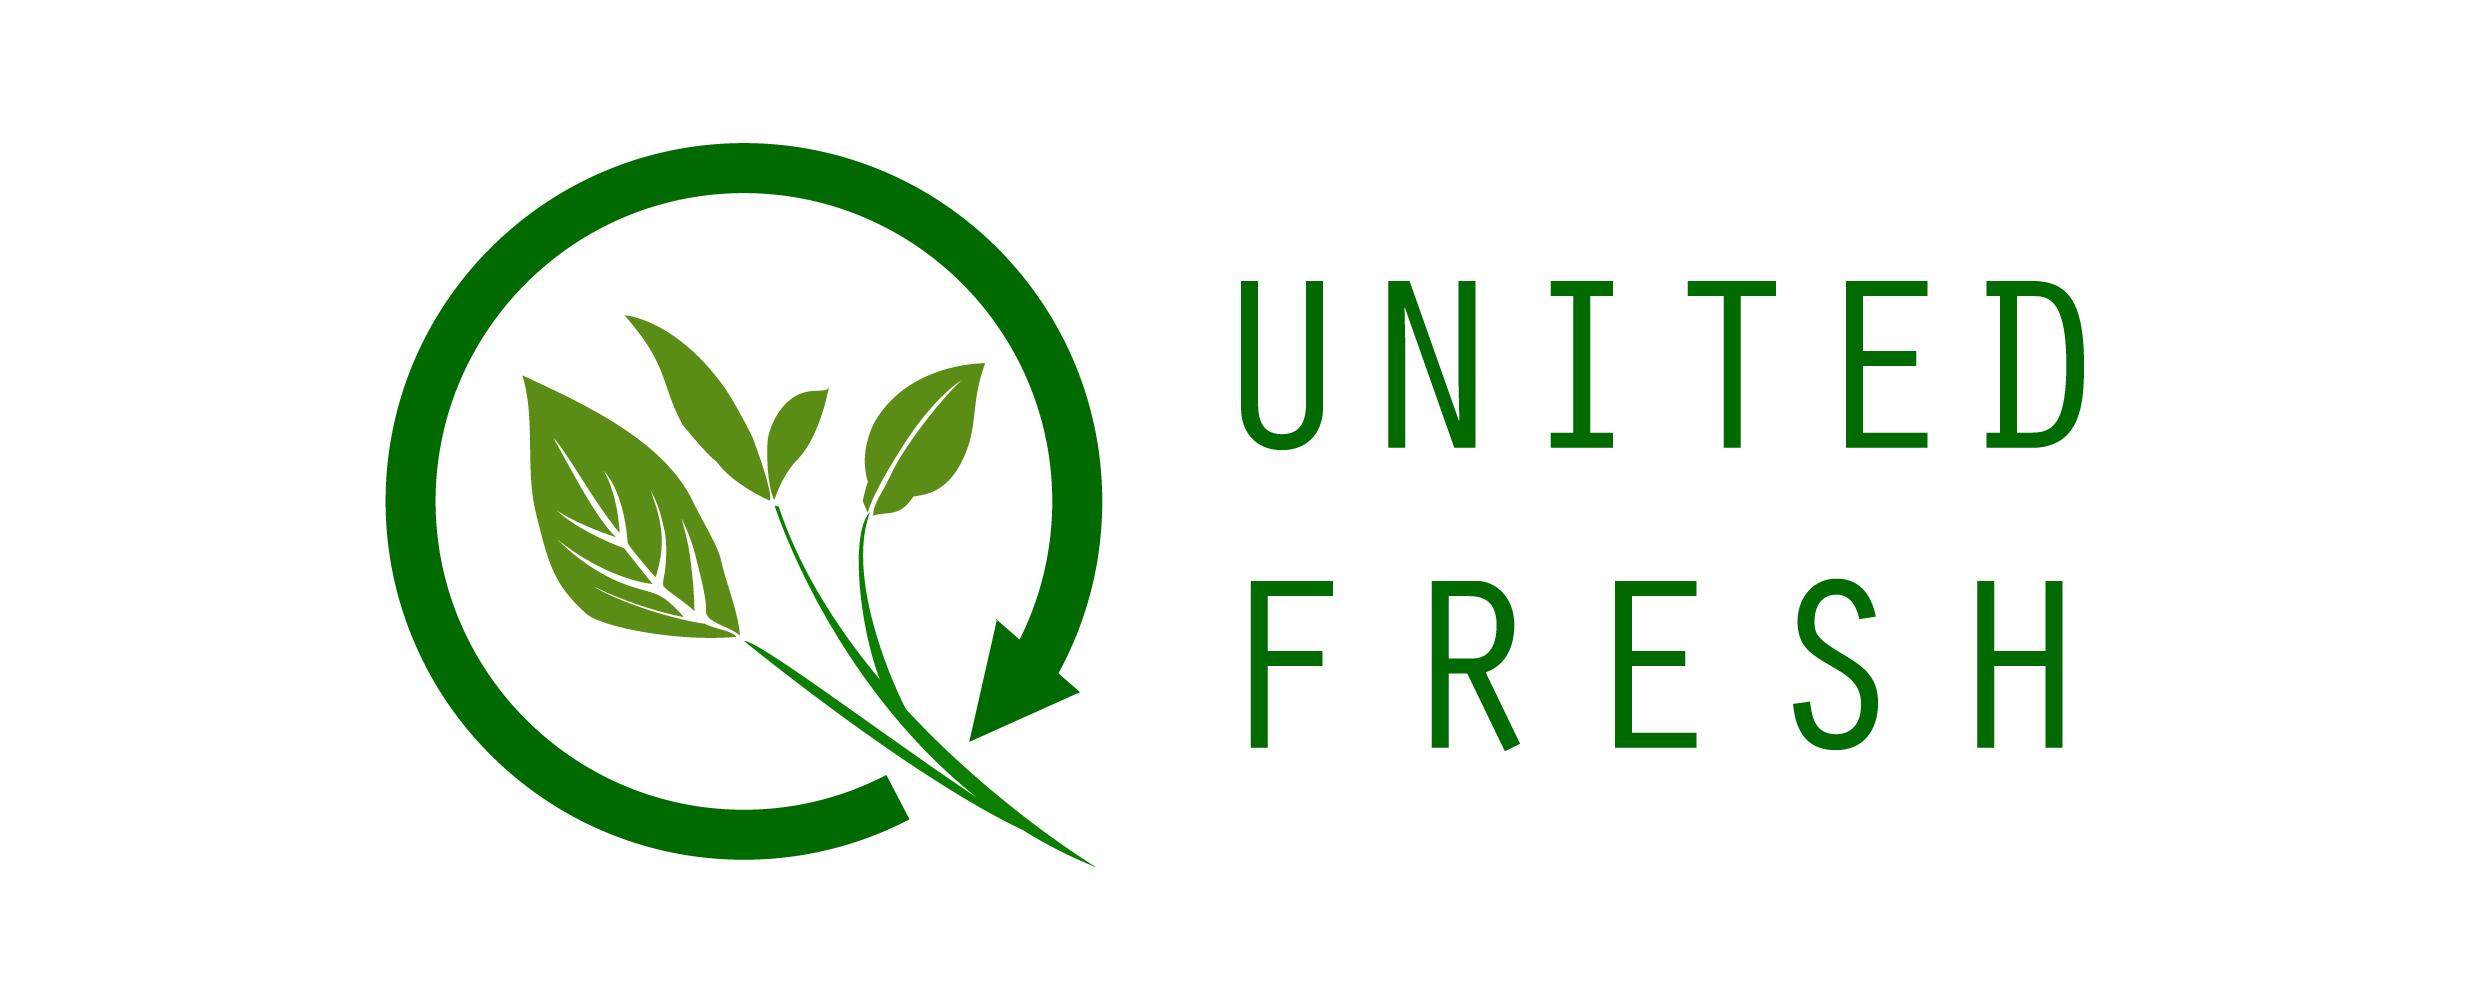 united_fresh-logo-01